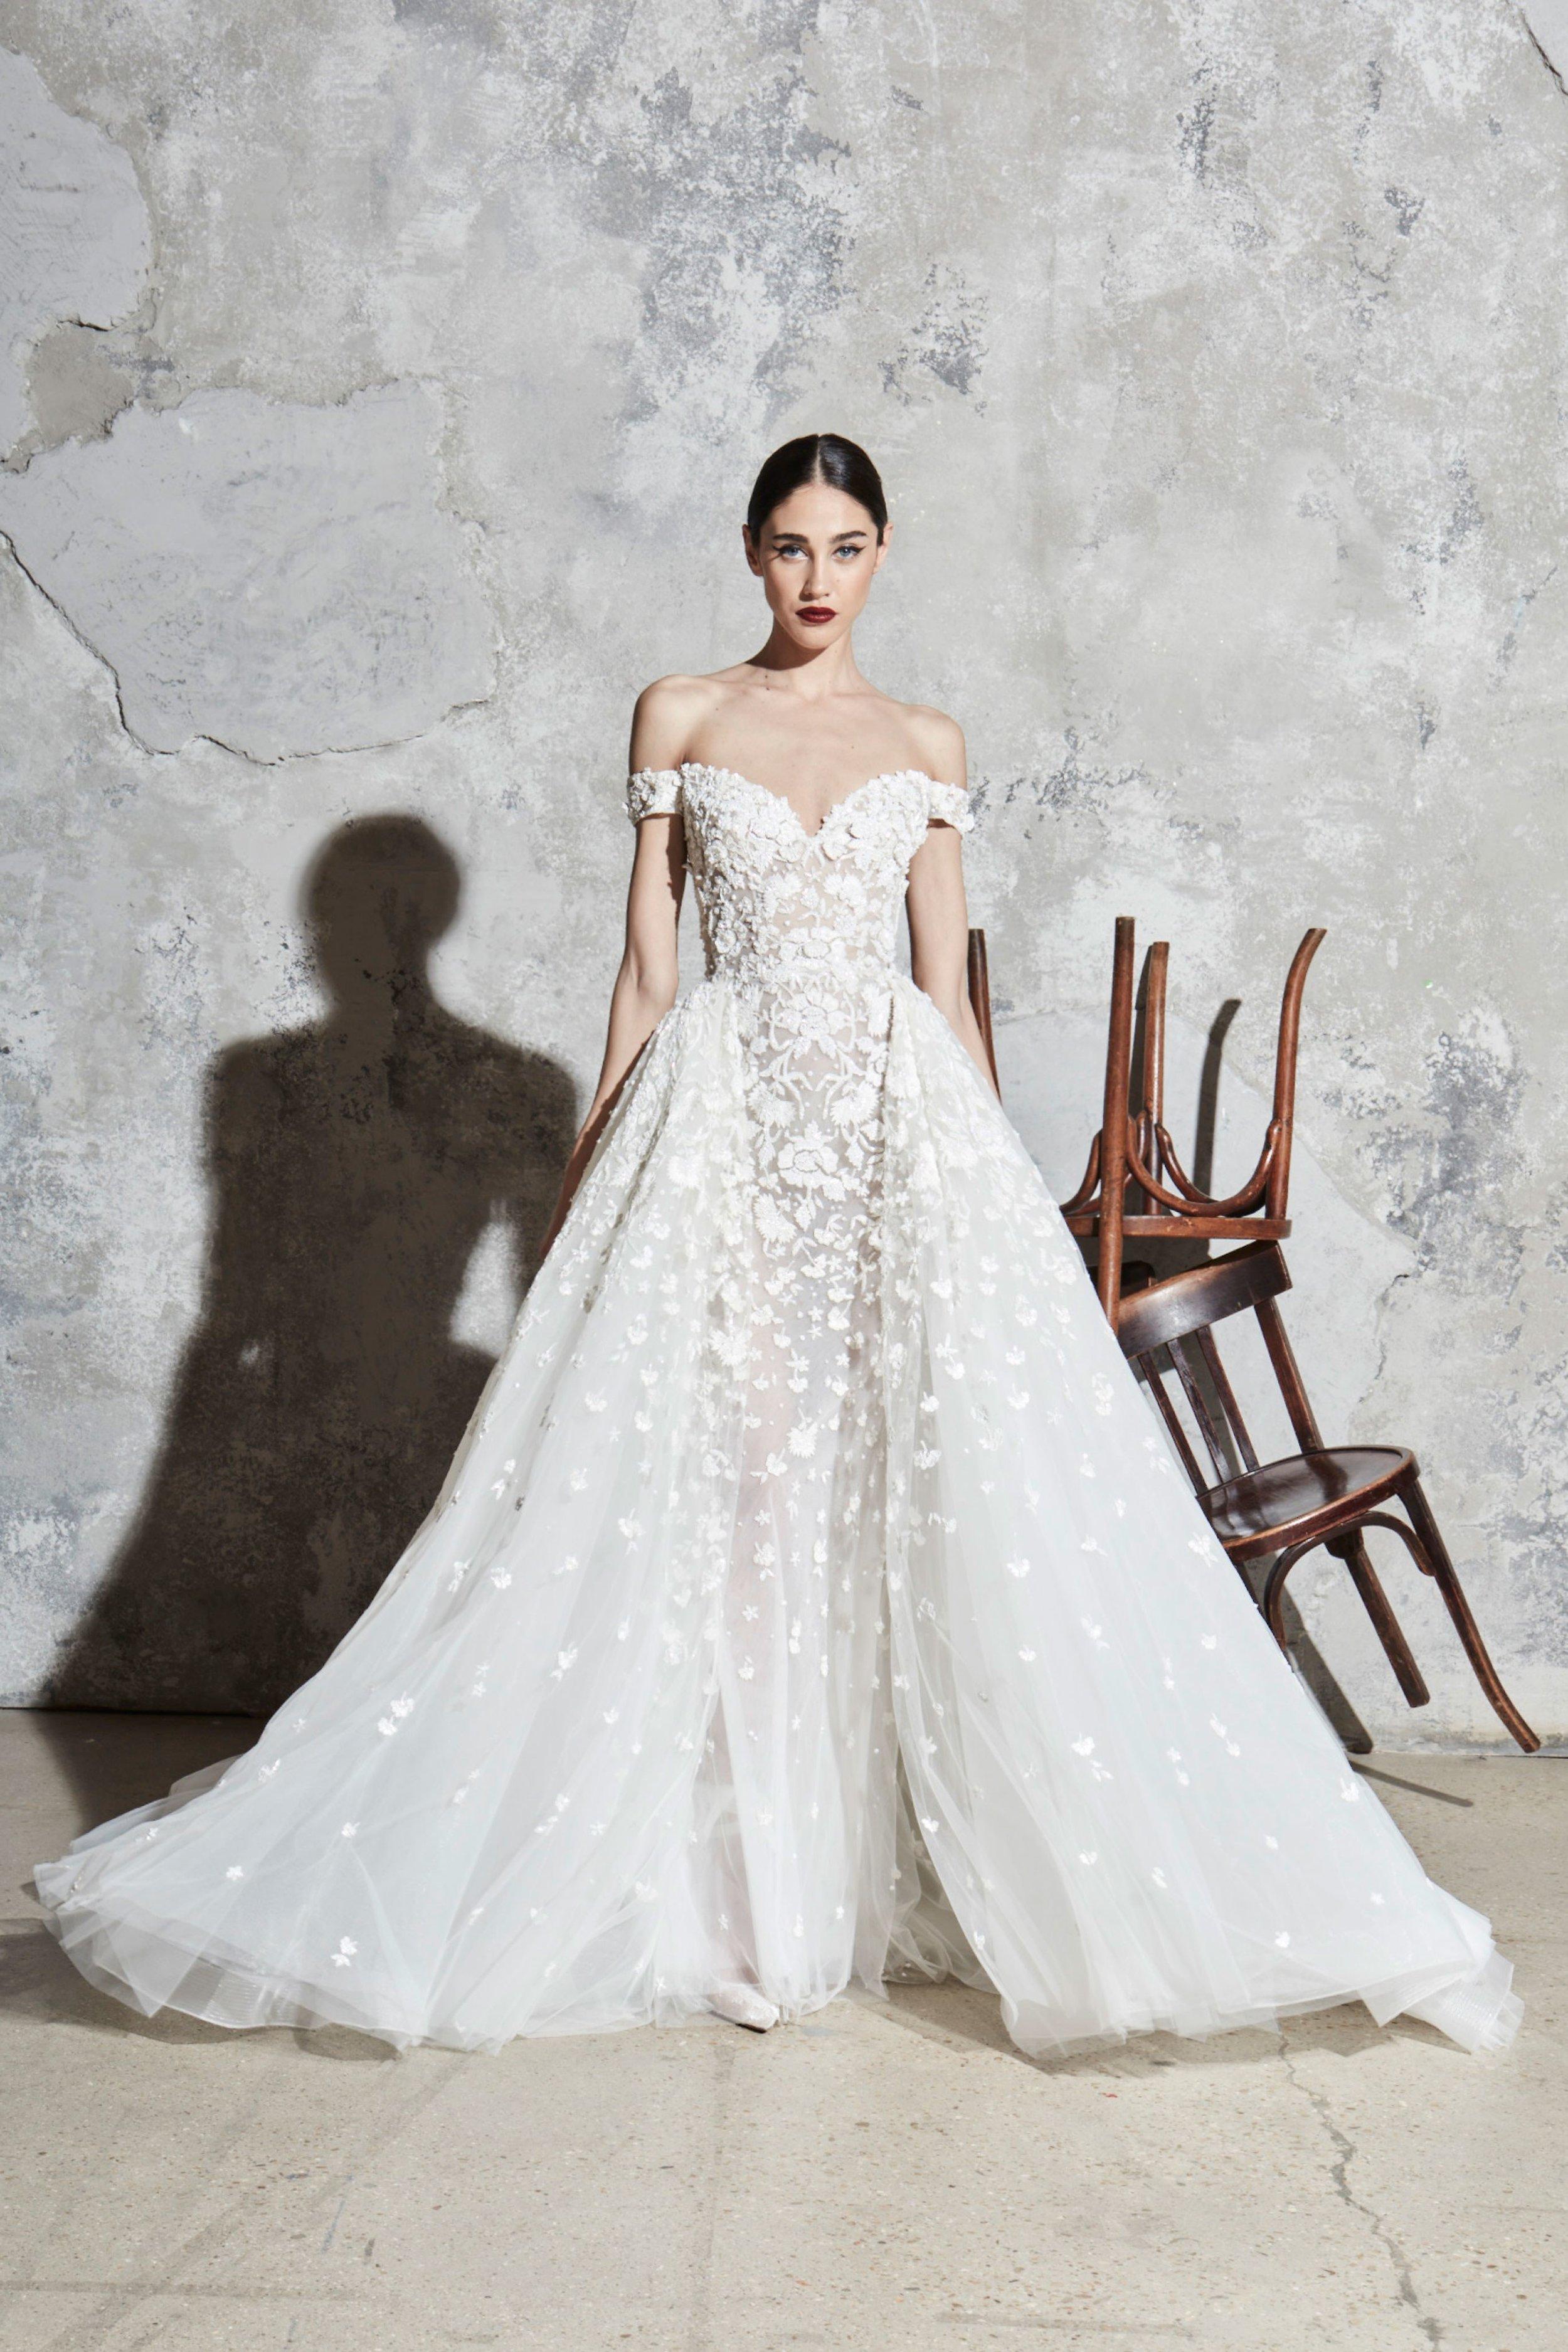 00022-zuhair-murad-new-york-bridal-Spring-2020-CREDIT-Thomas-Nutzl.jpg